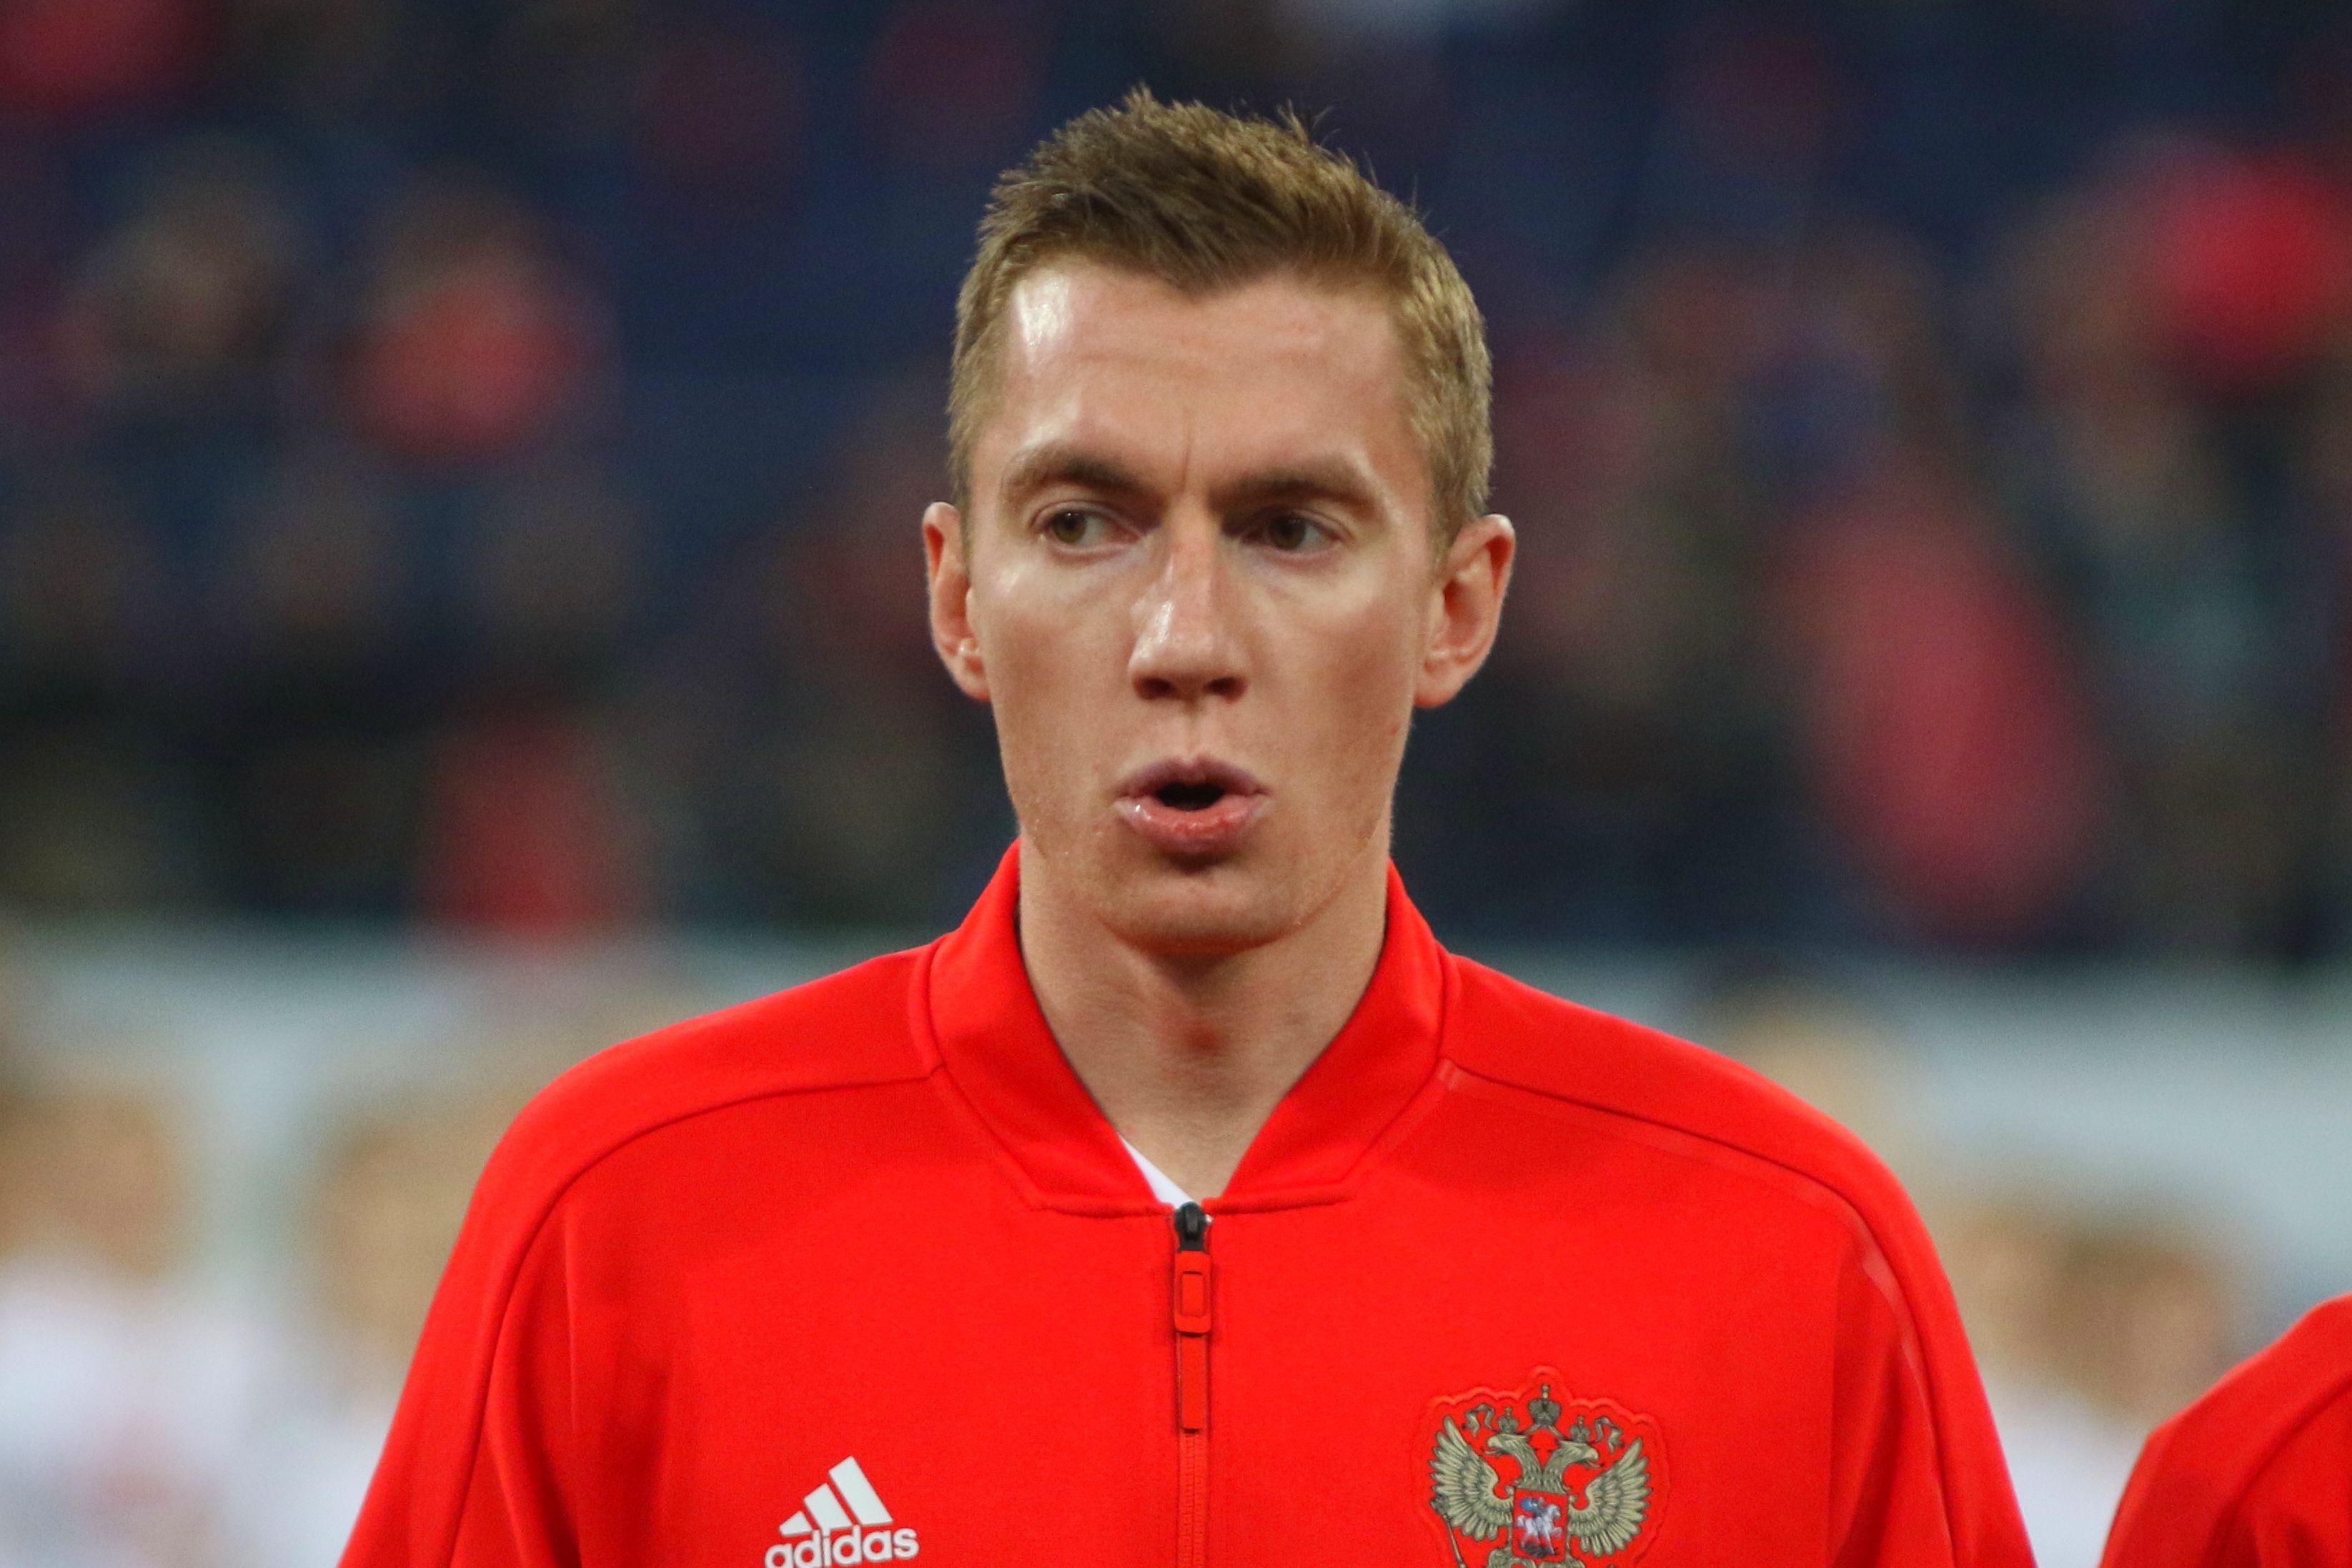 Арбитр Федотов заявил, что Семёнова незаслуженно удалили в матче с Турцией